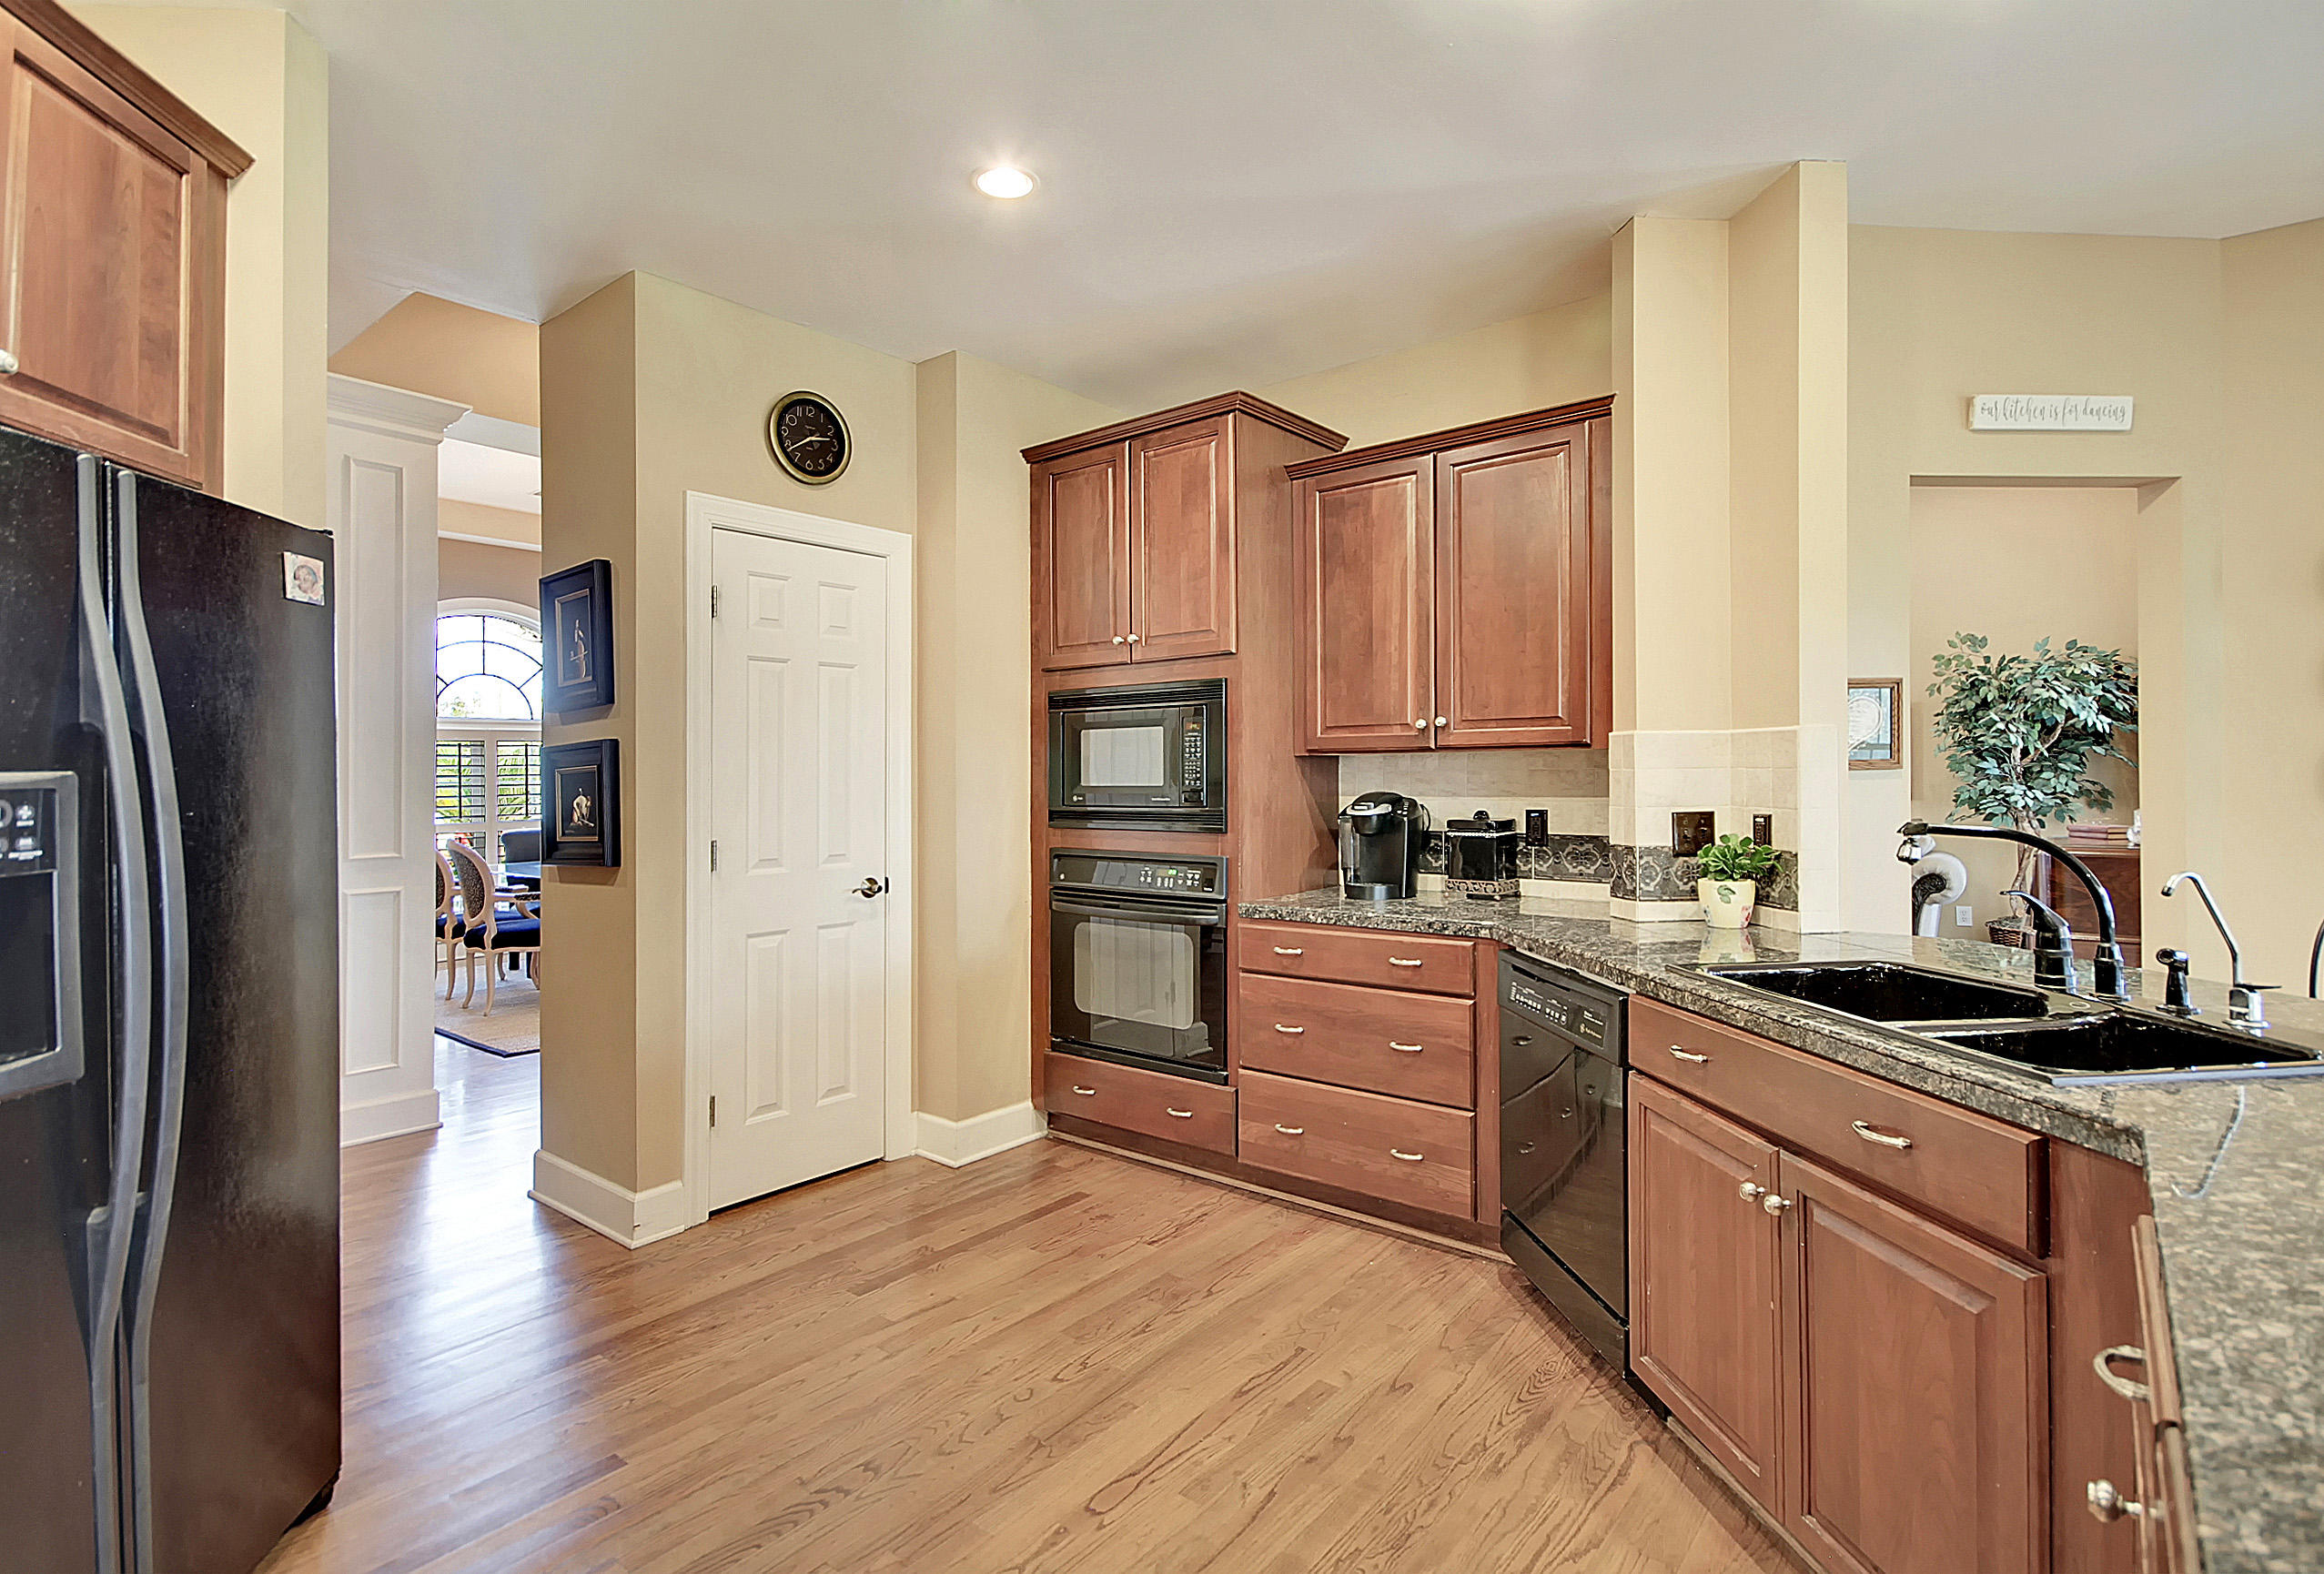 Dunes West Homes For Sale - 4002 Colonel Vanderhorst, Mount Pleasant, SC - 14